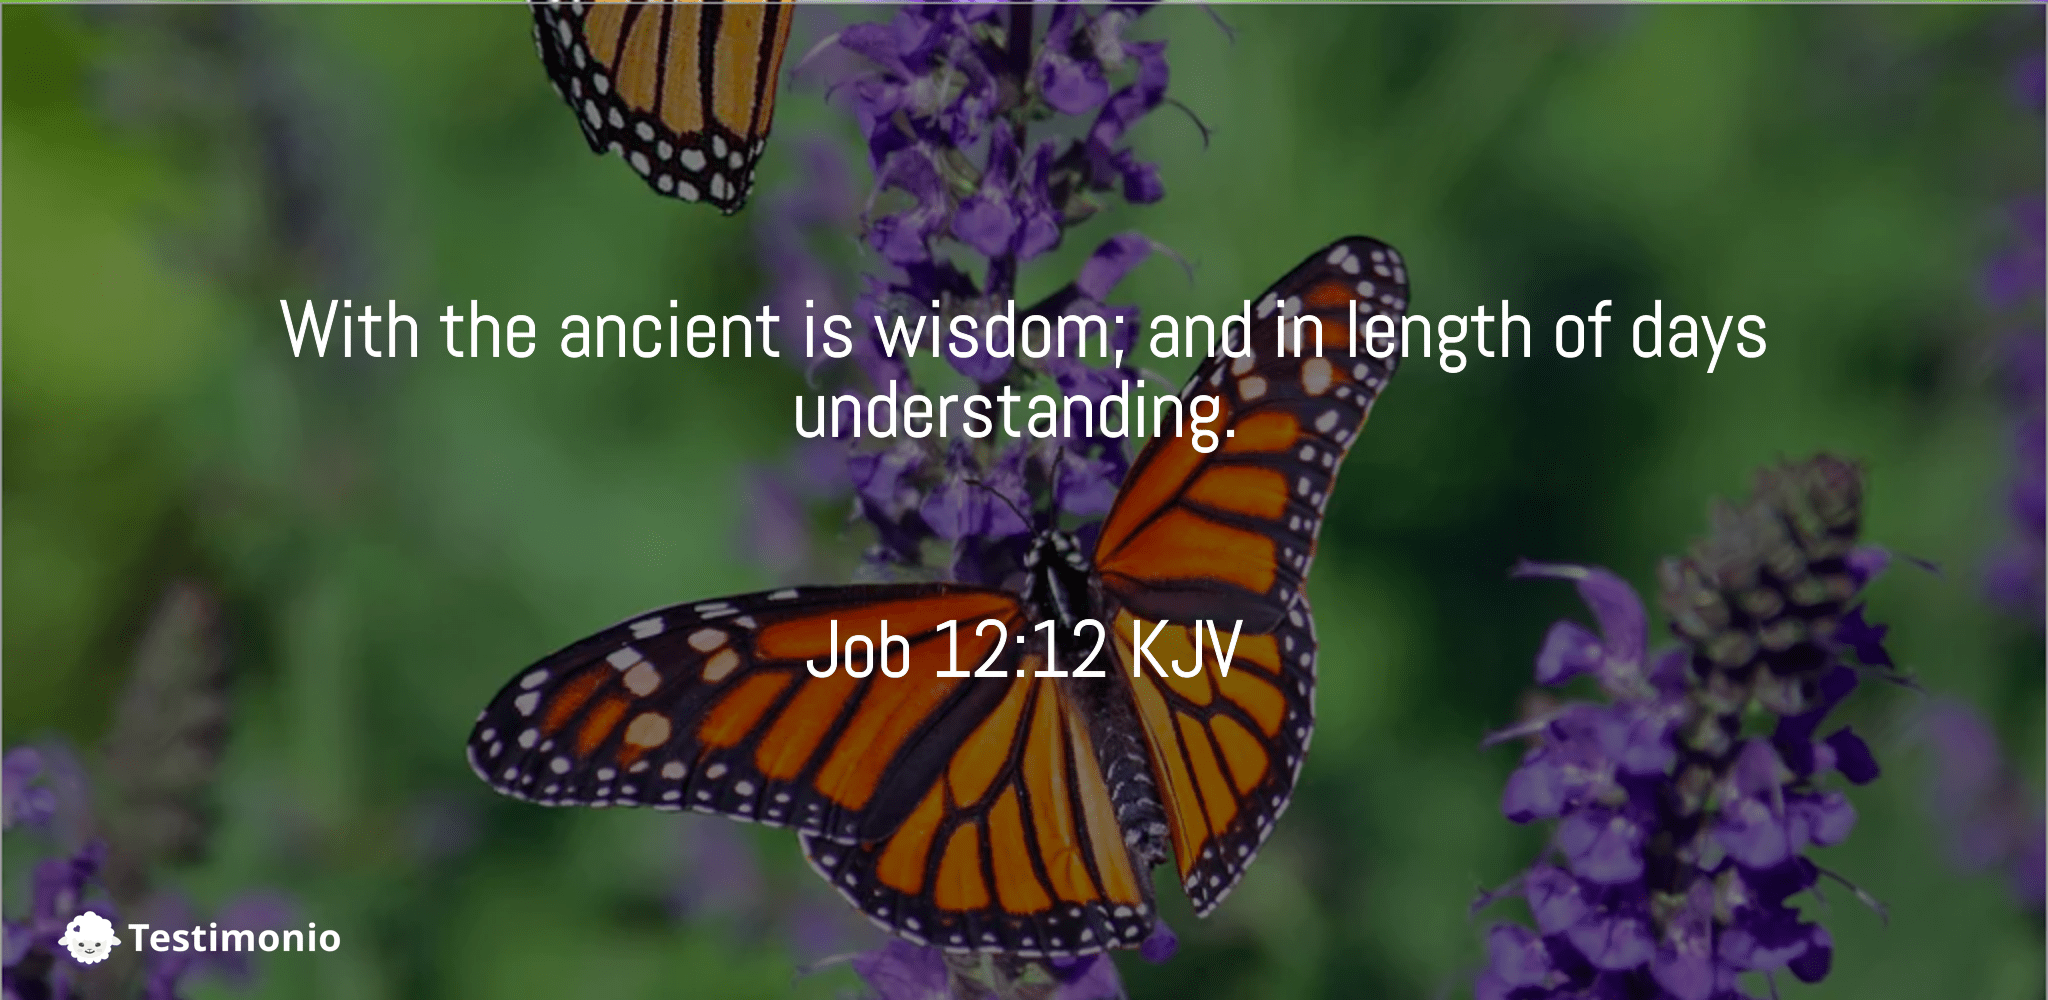 Job 12:12